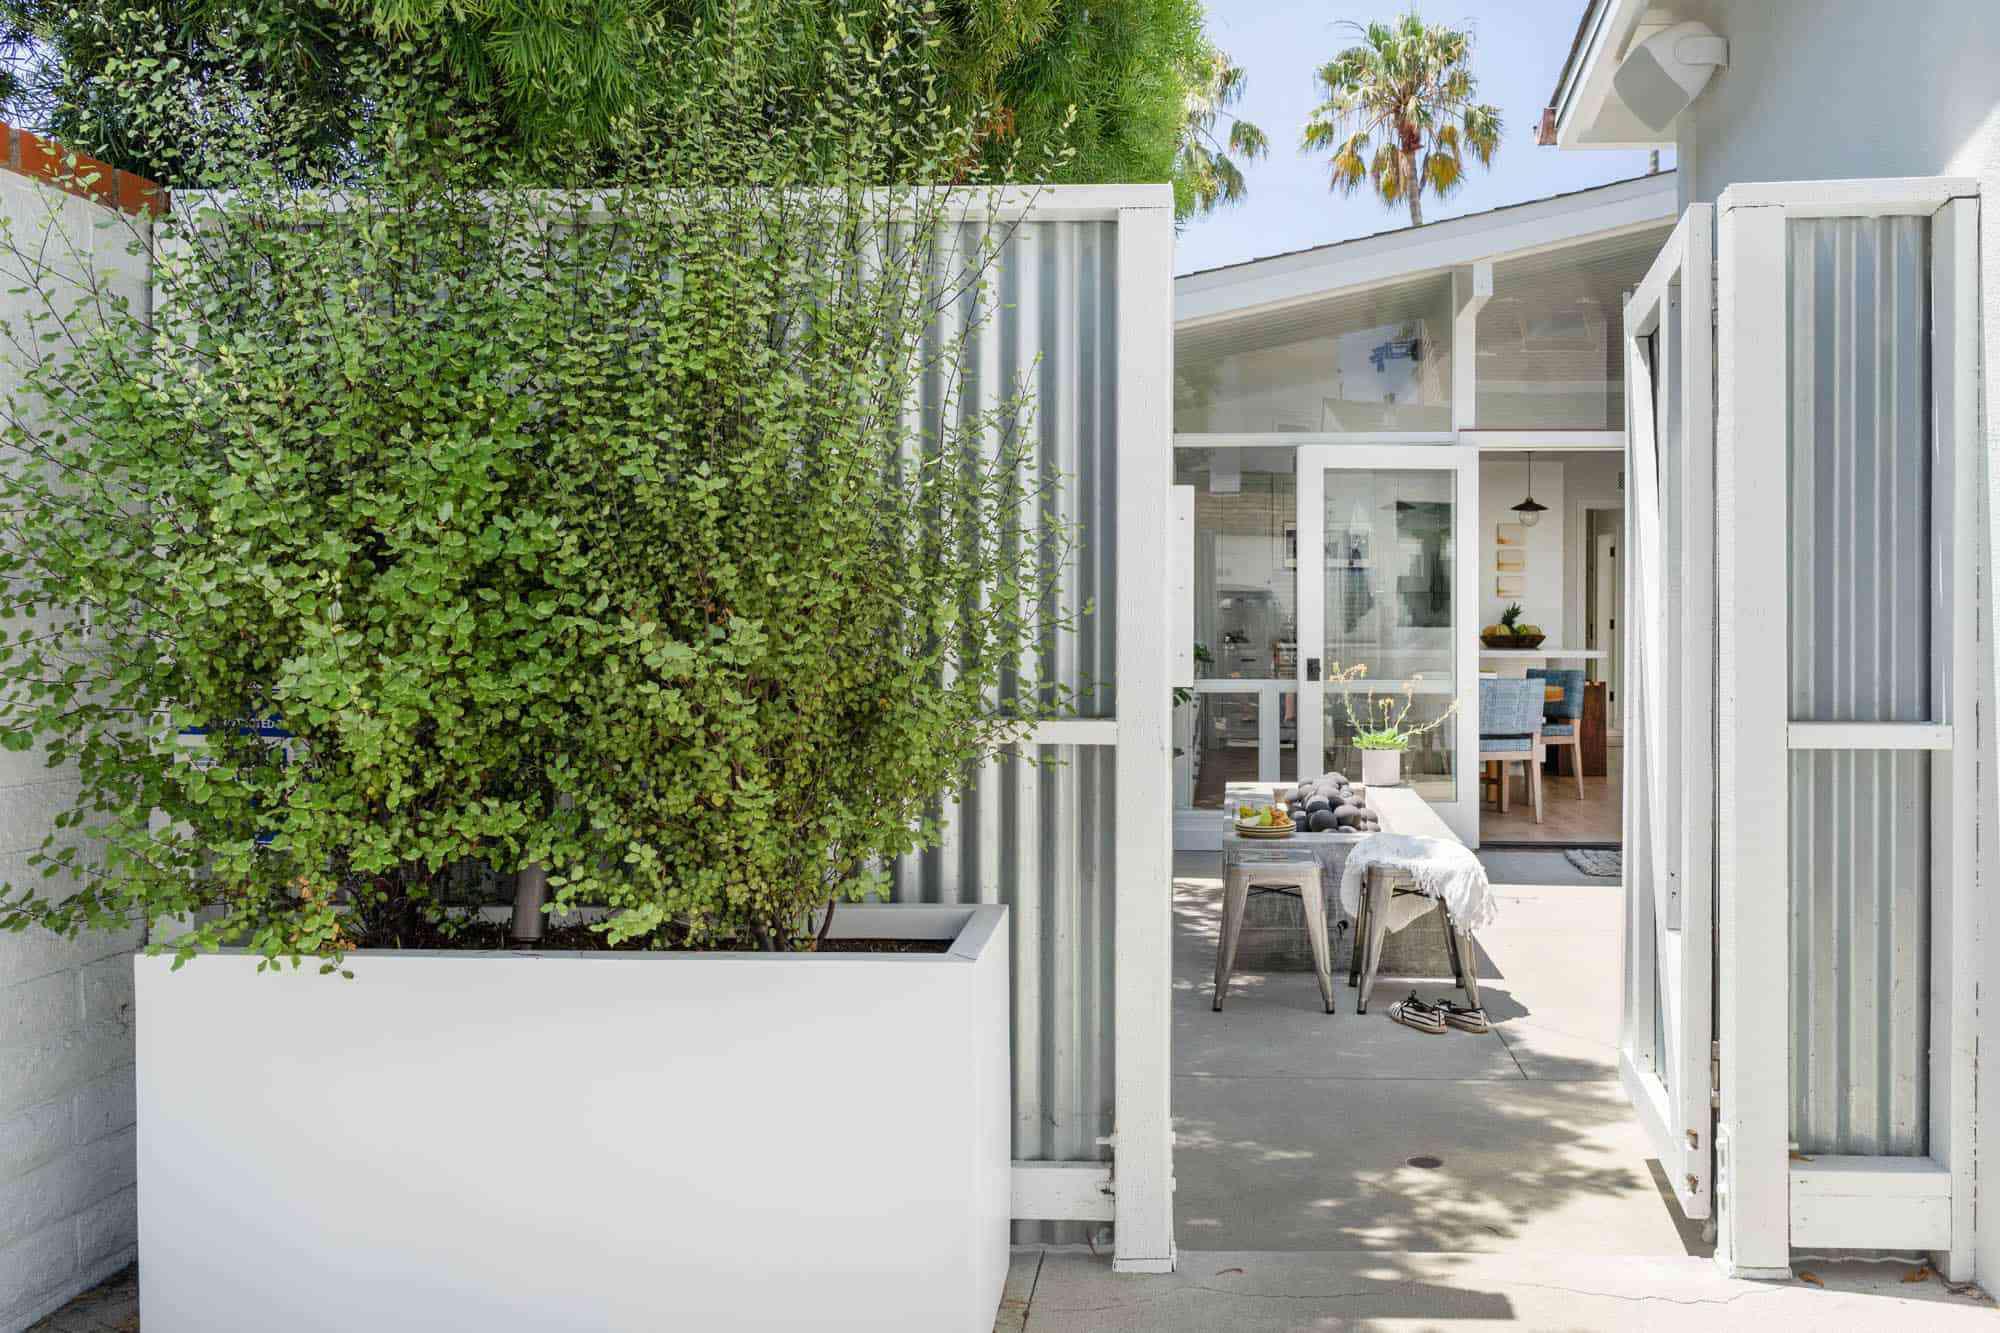 Mindy Gayer privacy fence